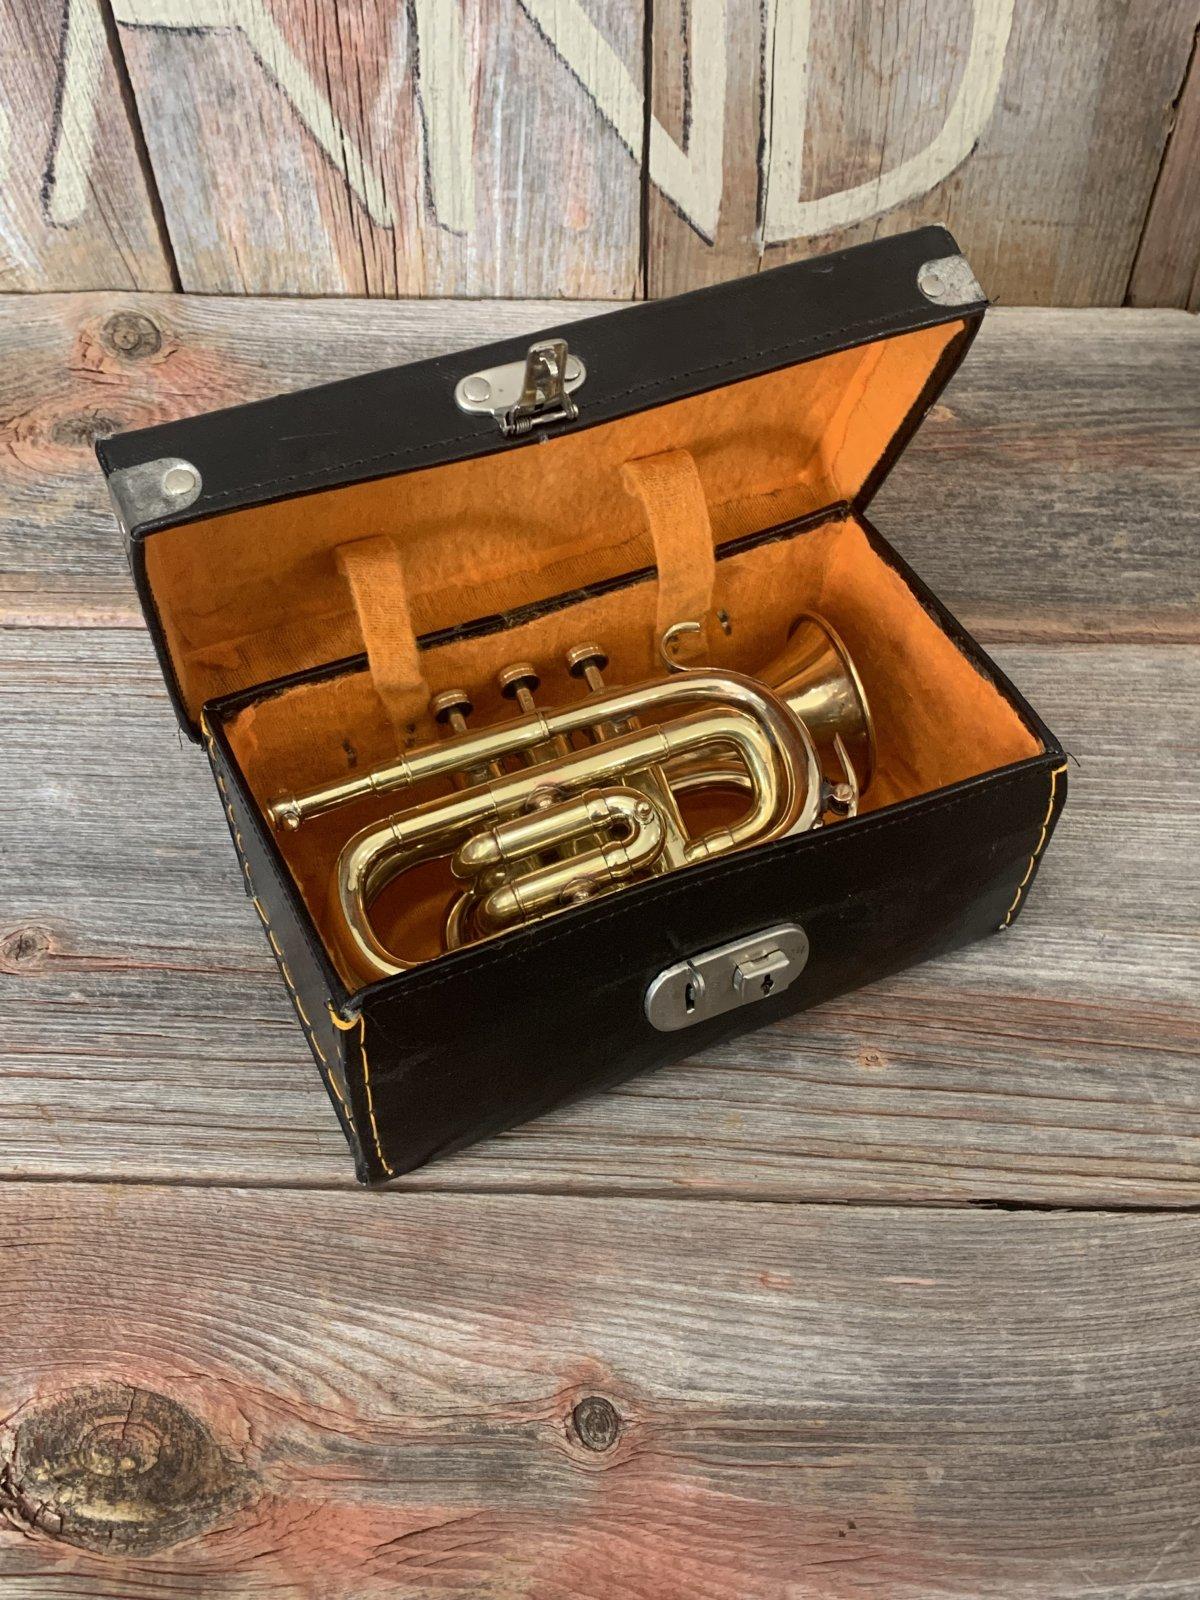 Unmarked Vintage Pocket Trumpet Raw Brass - Used